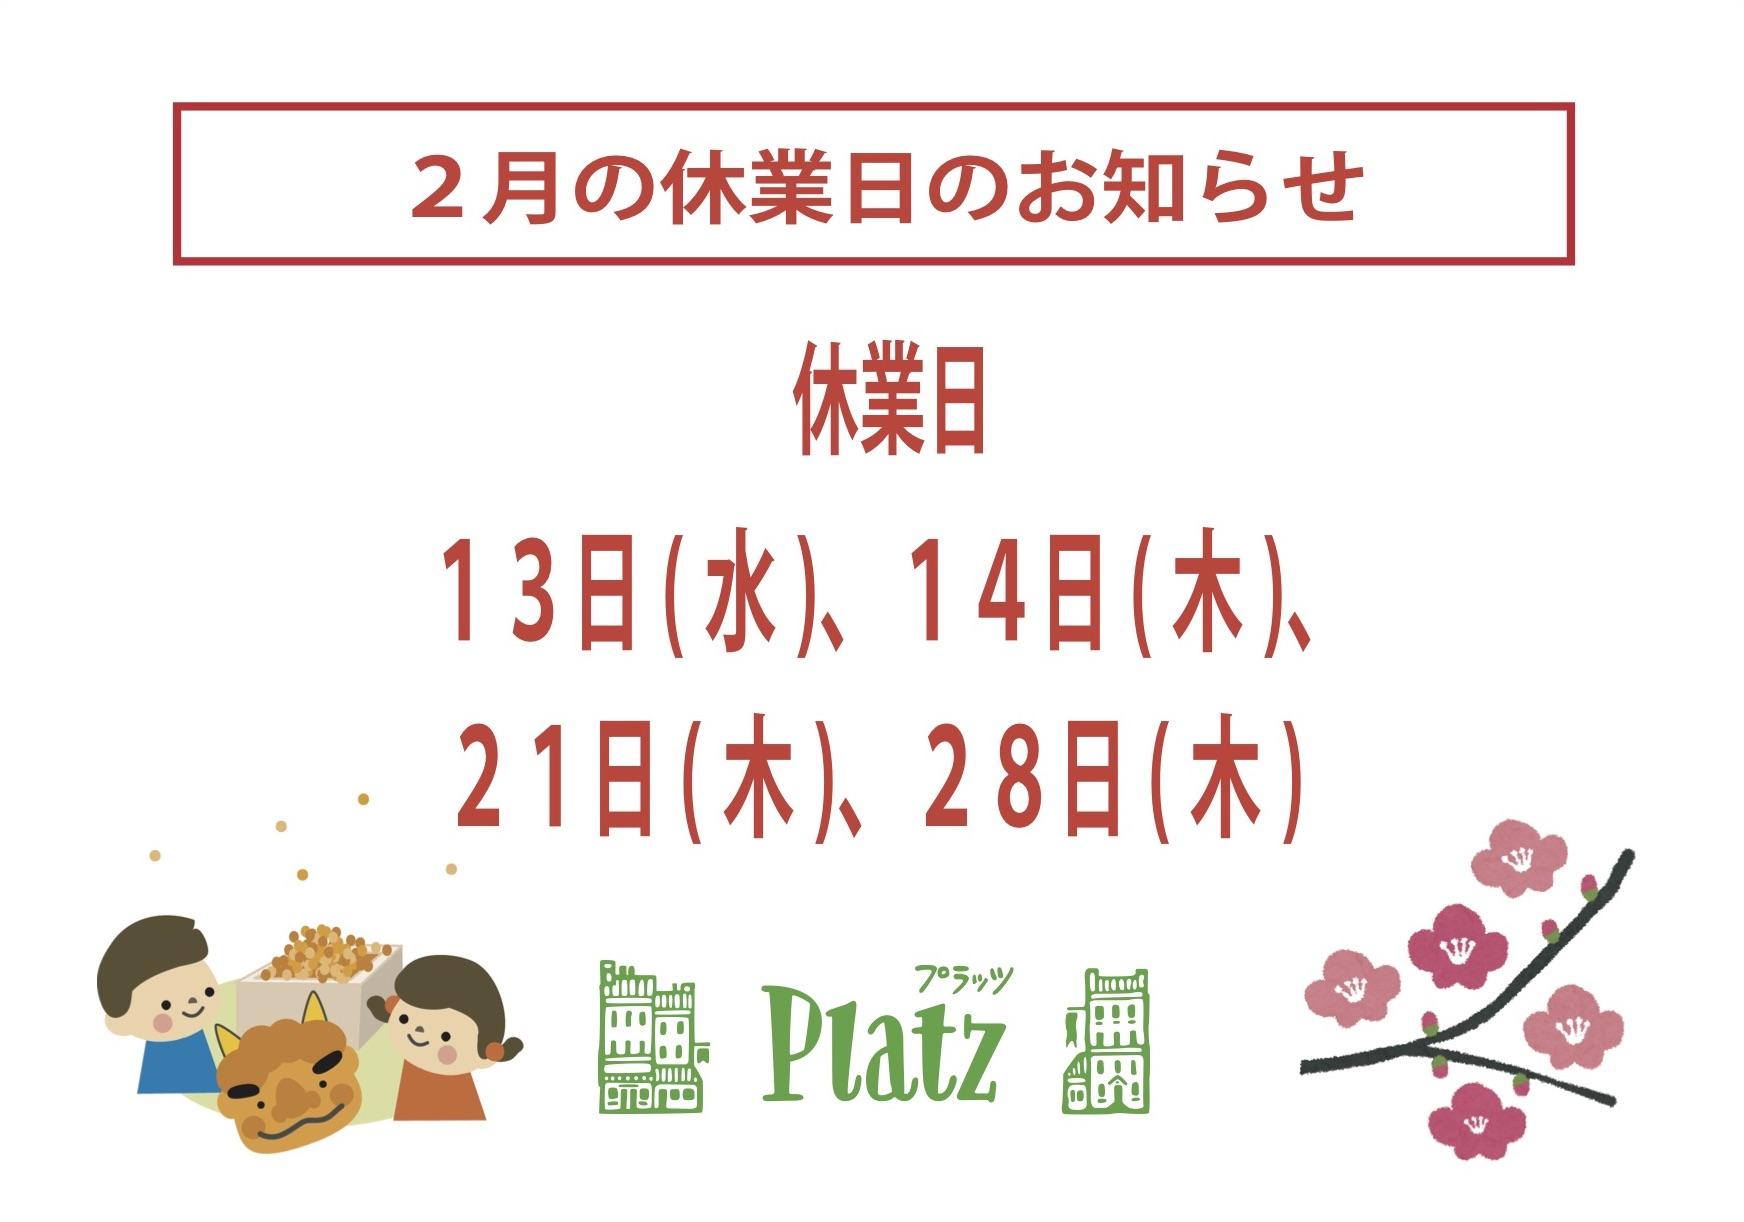 http://www.kyoto-platz.jp/news/images/2019.2%E6%9C%88%E4%BC%91%E6%A5%AD%E6%97%A5%E3%81%AE%E3%82%B3%E3%83%94%E3%83%BC.jpg